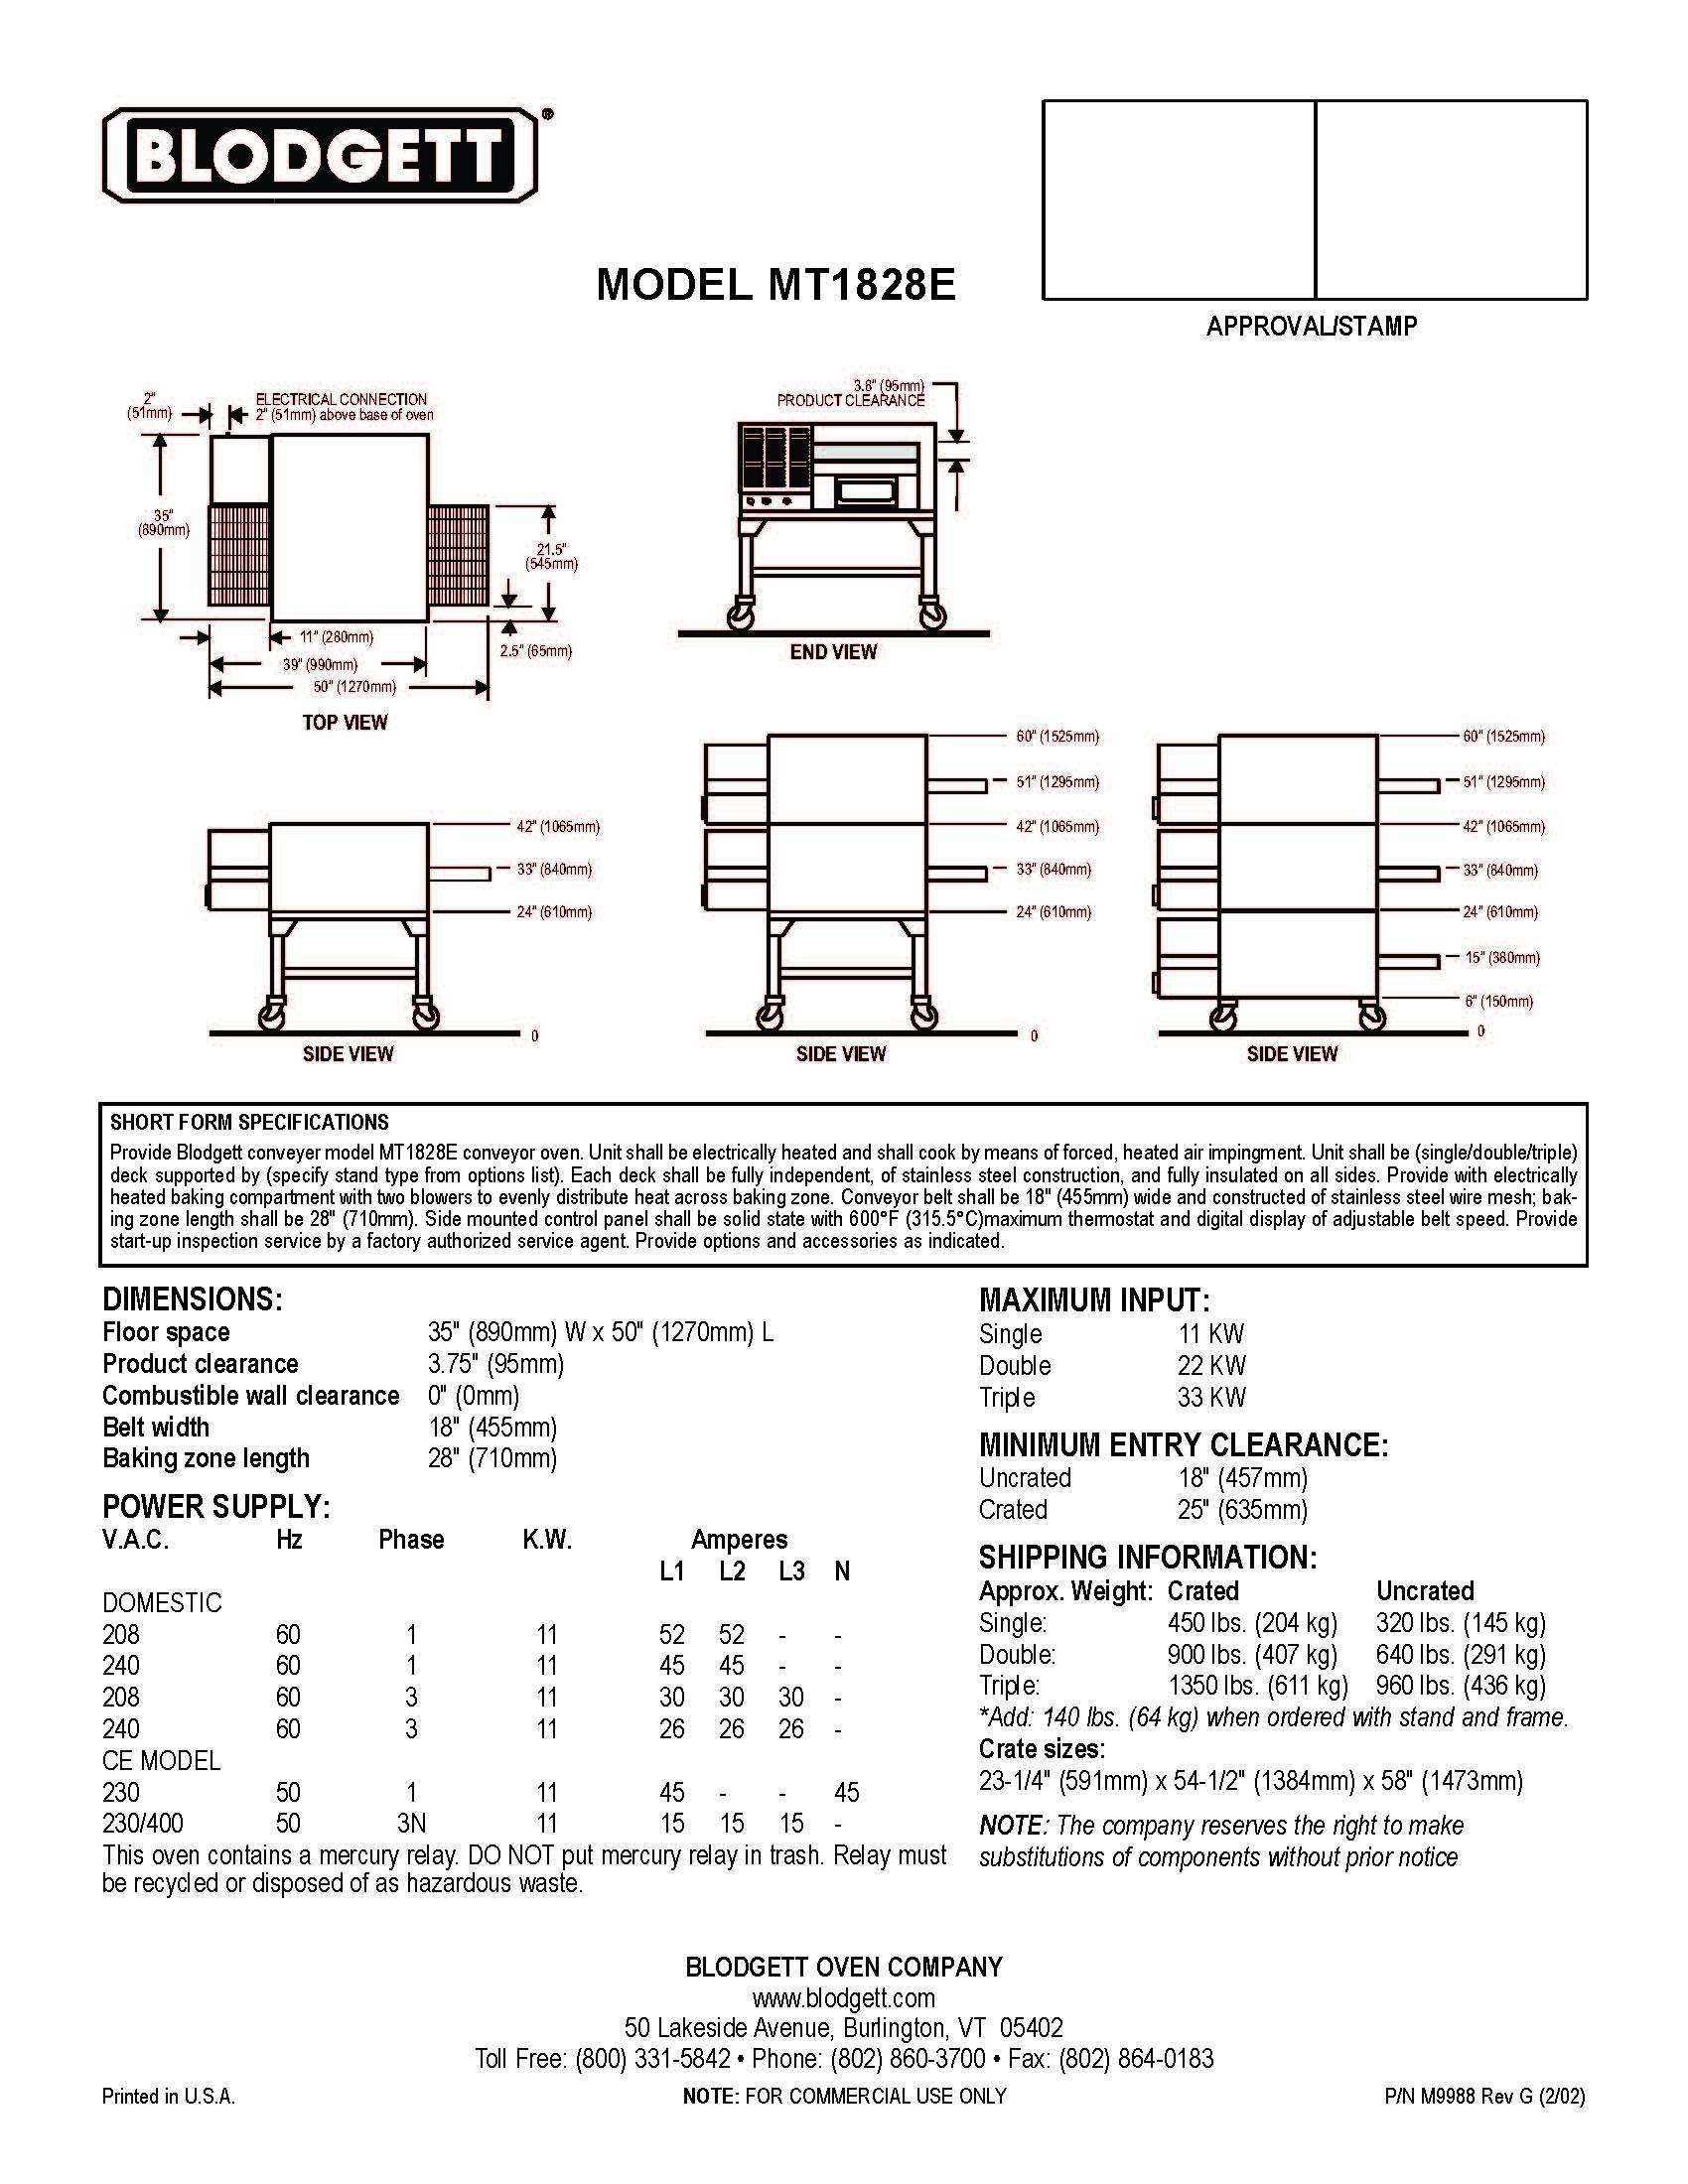 Blodgett Mark V Wiring Diagram Wiring Library